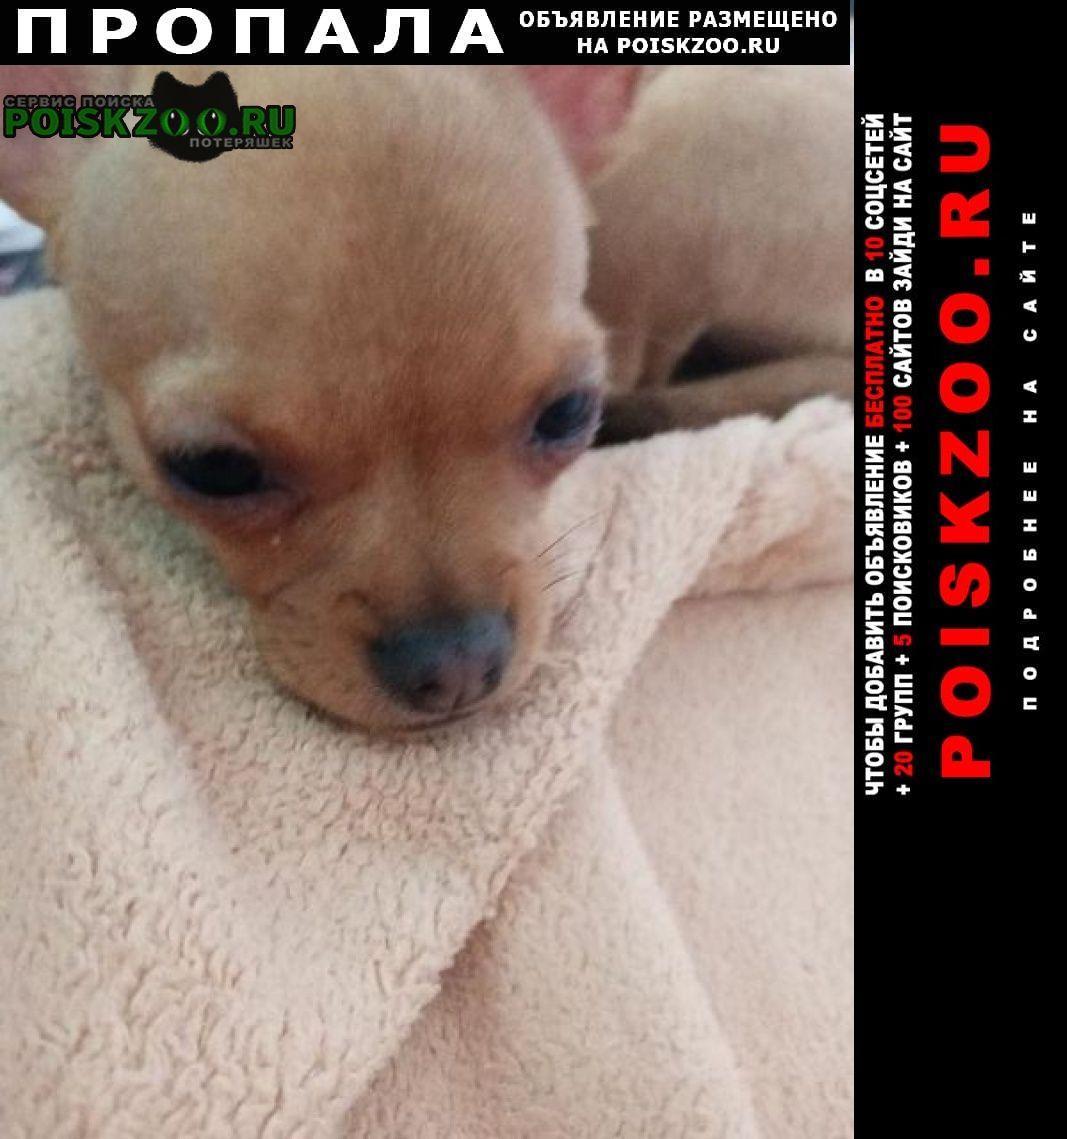 Пропала собака чихуахуа прикубанский округ Краснодар